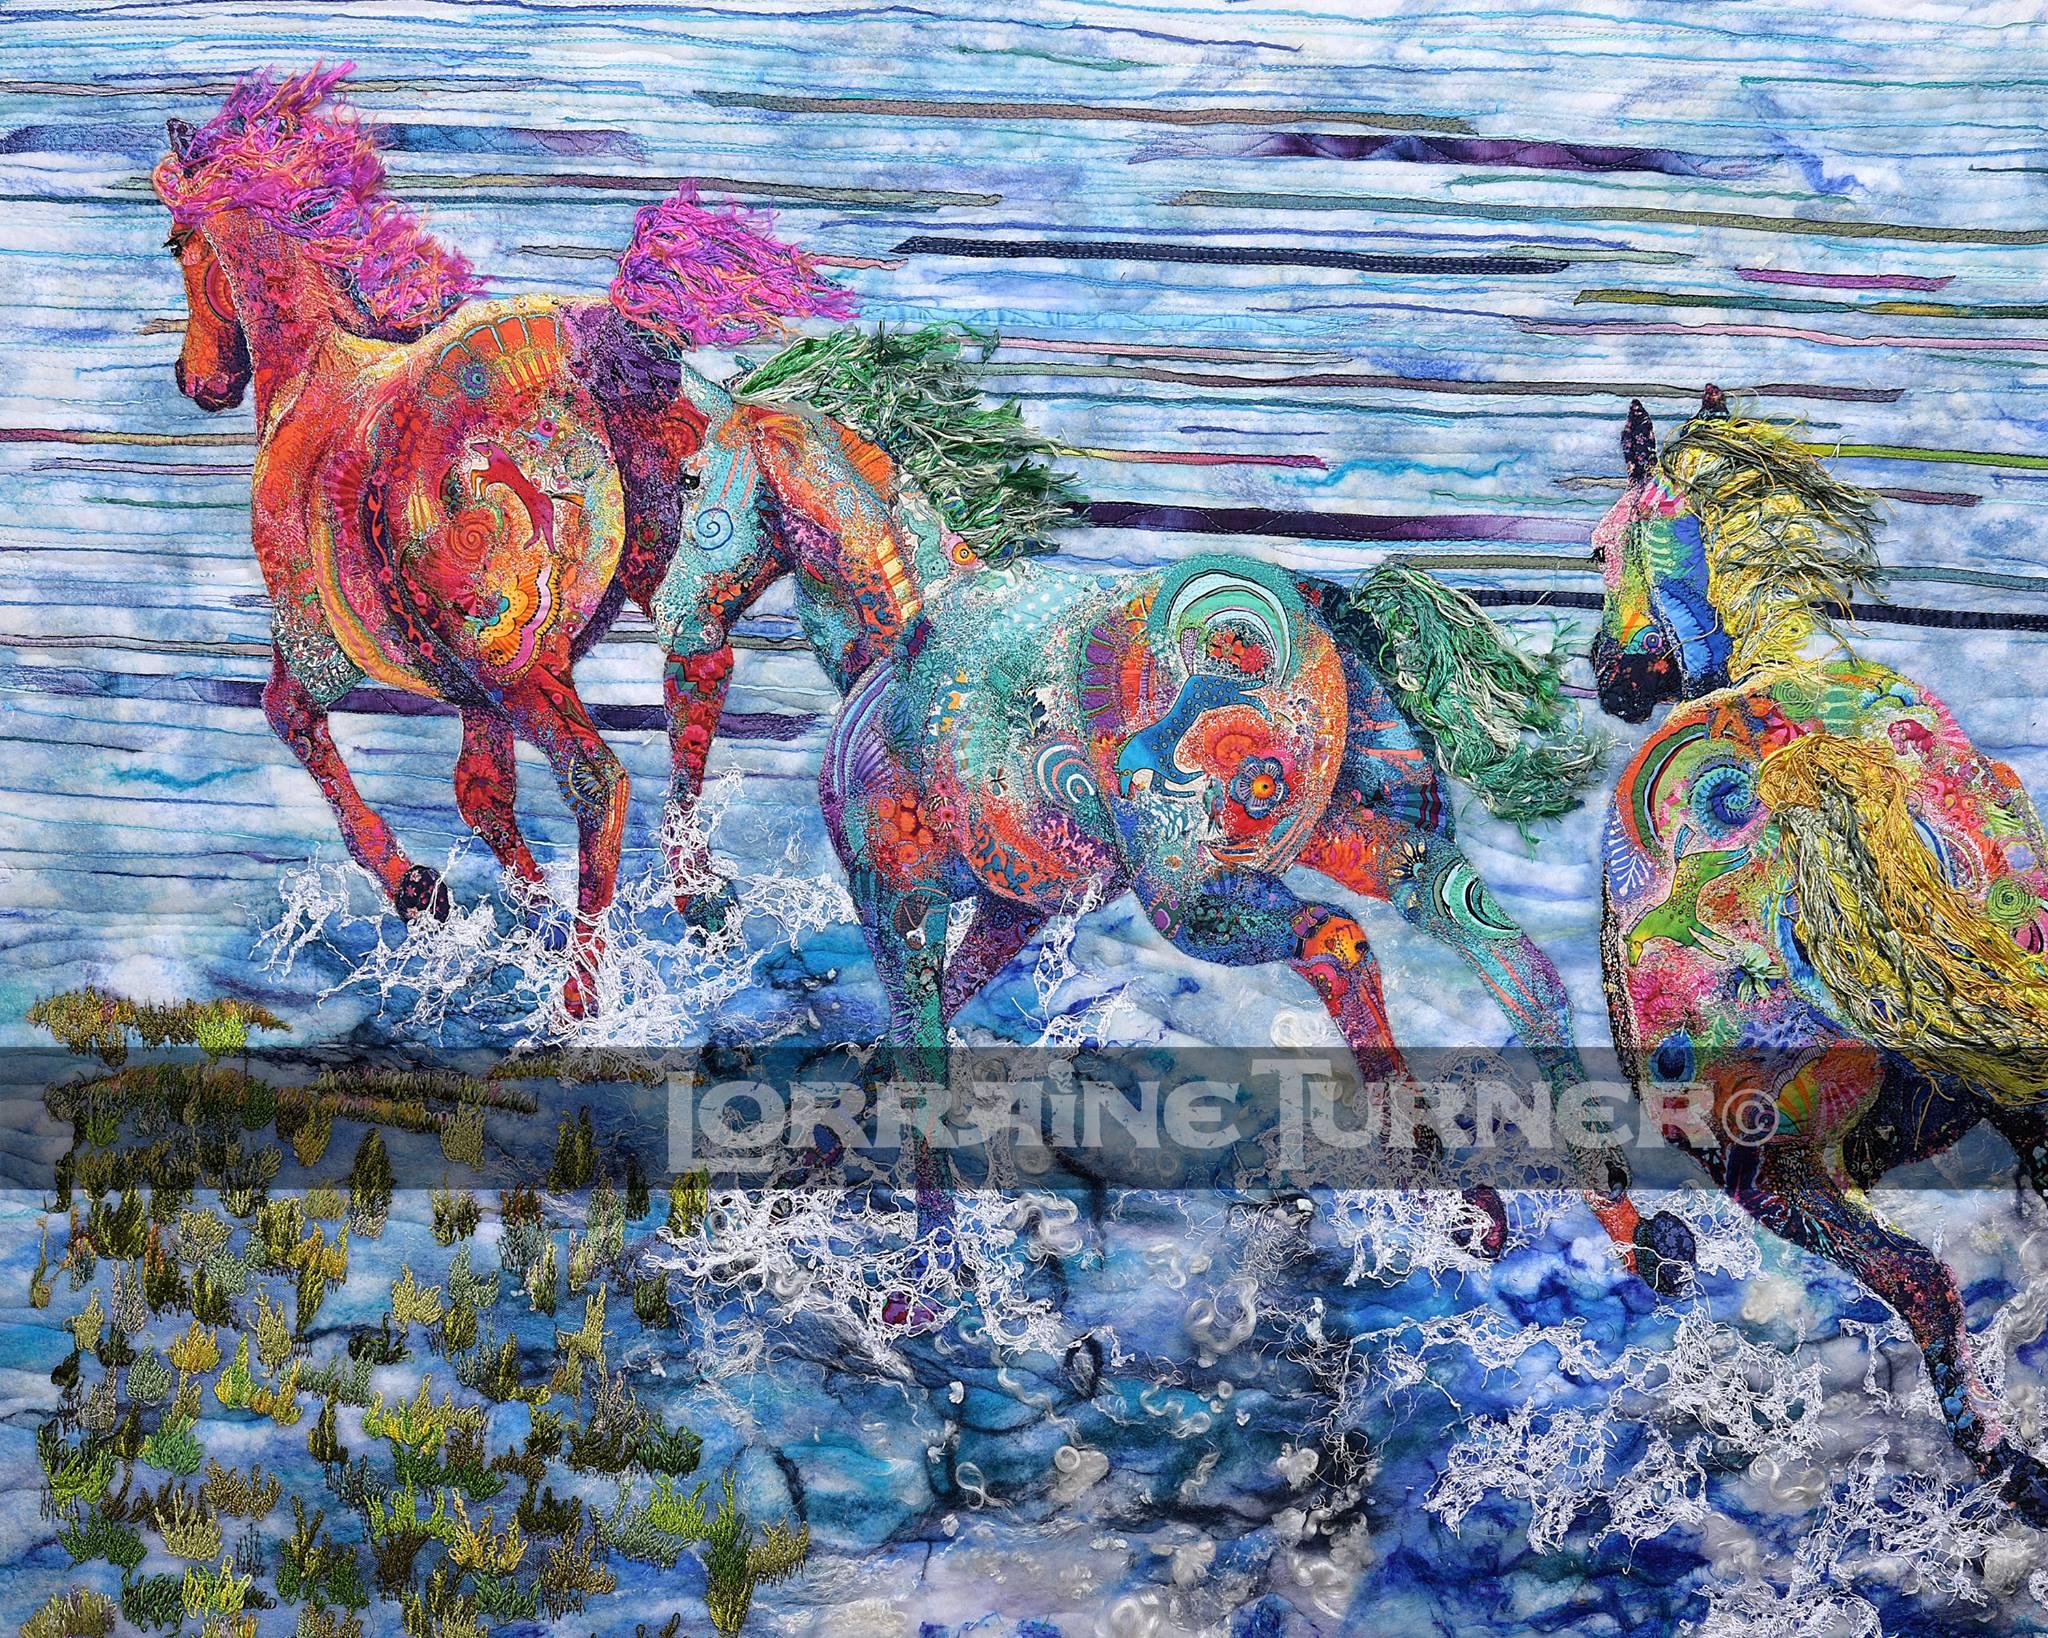 Lorraine Turn Art01